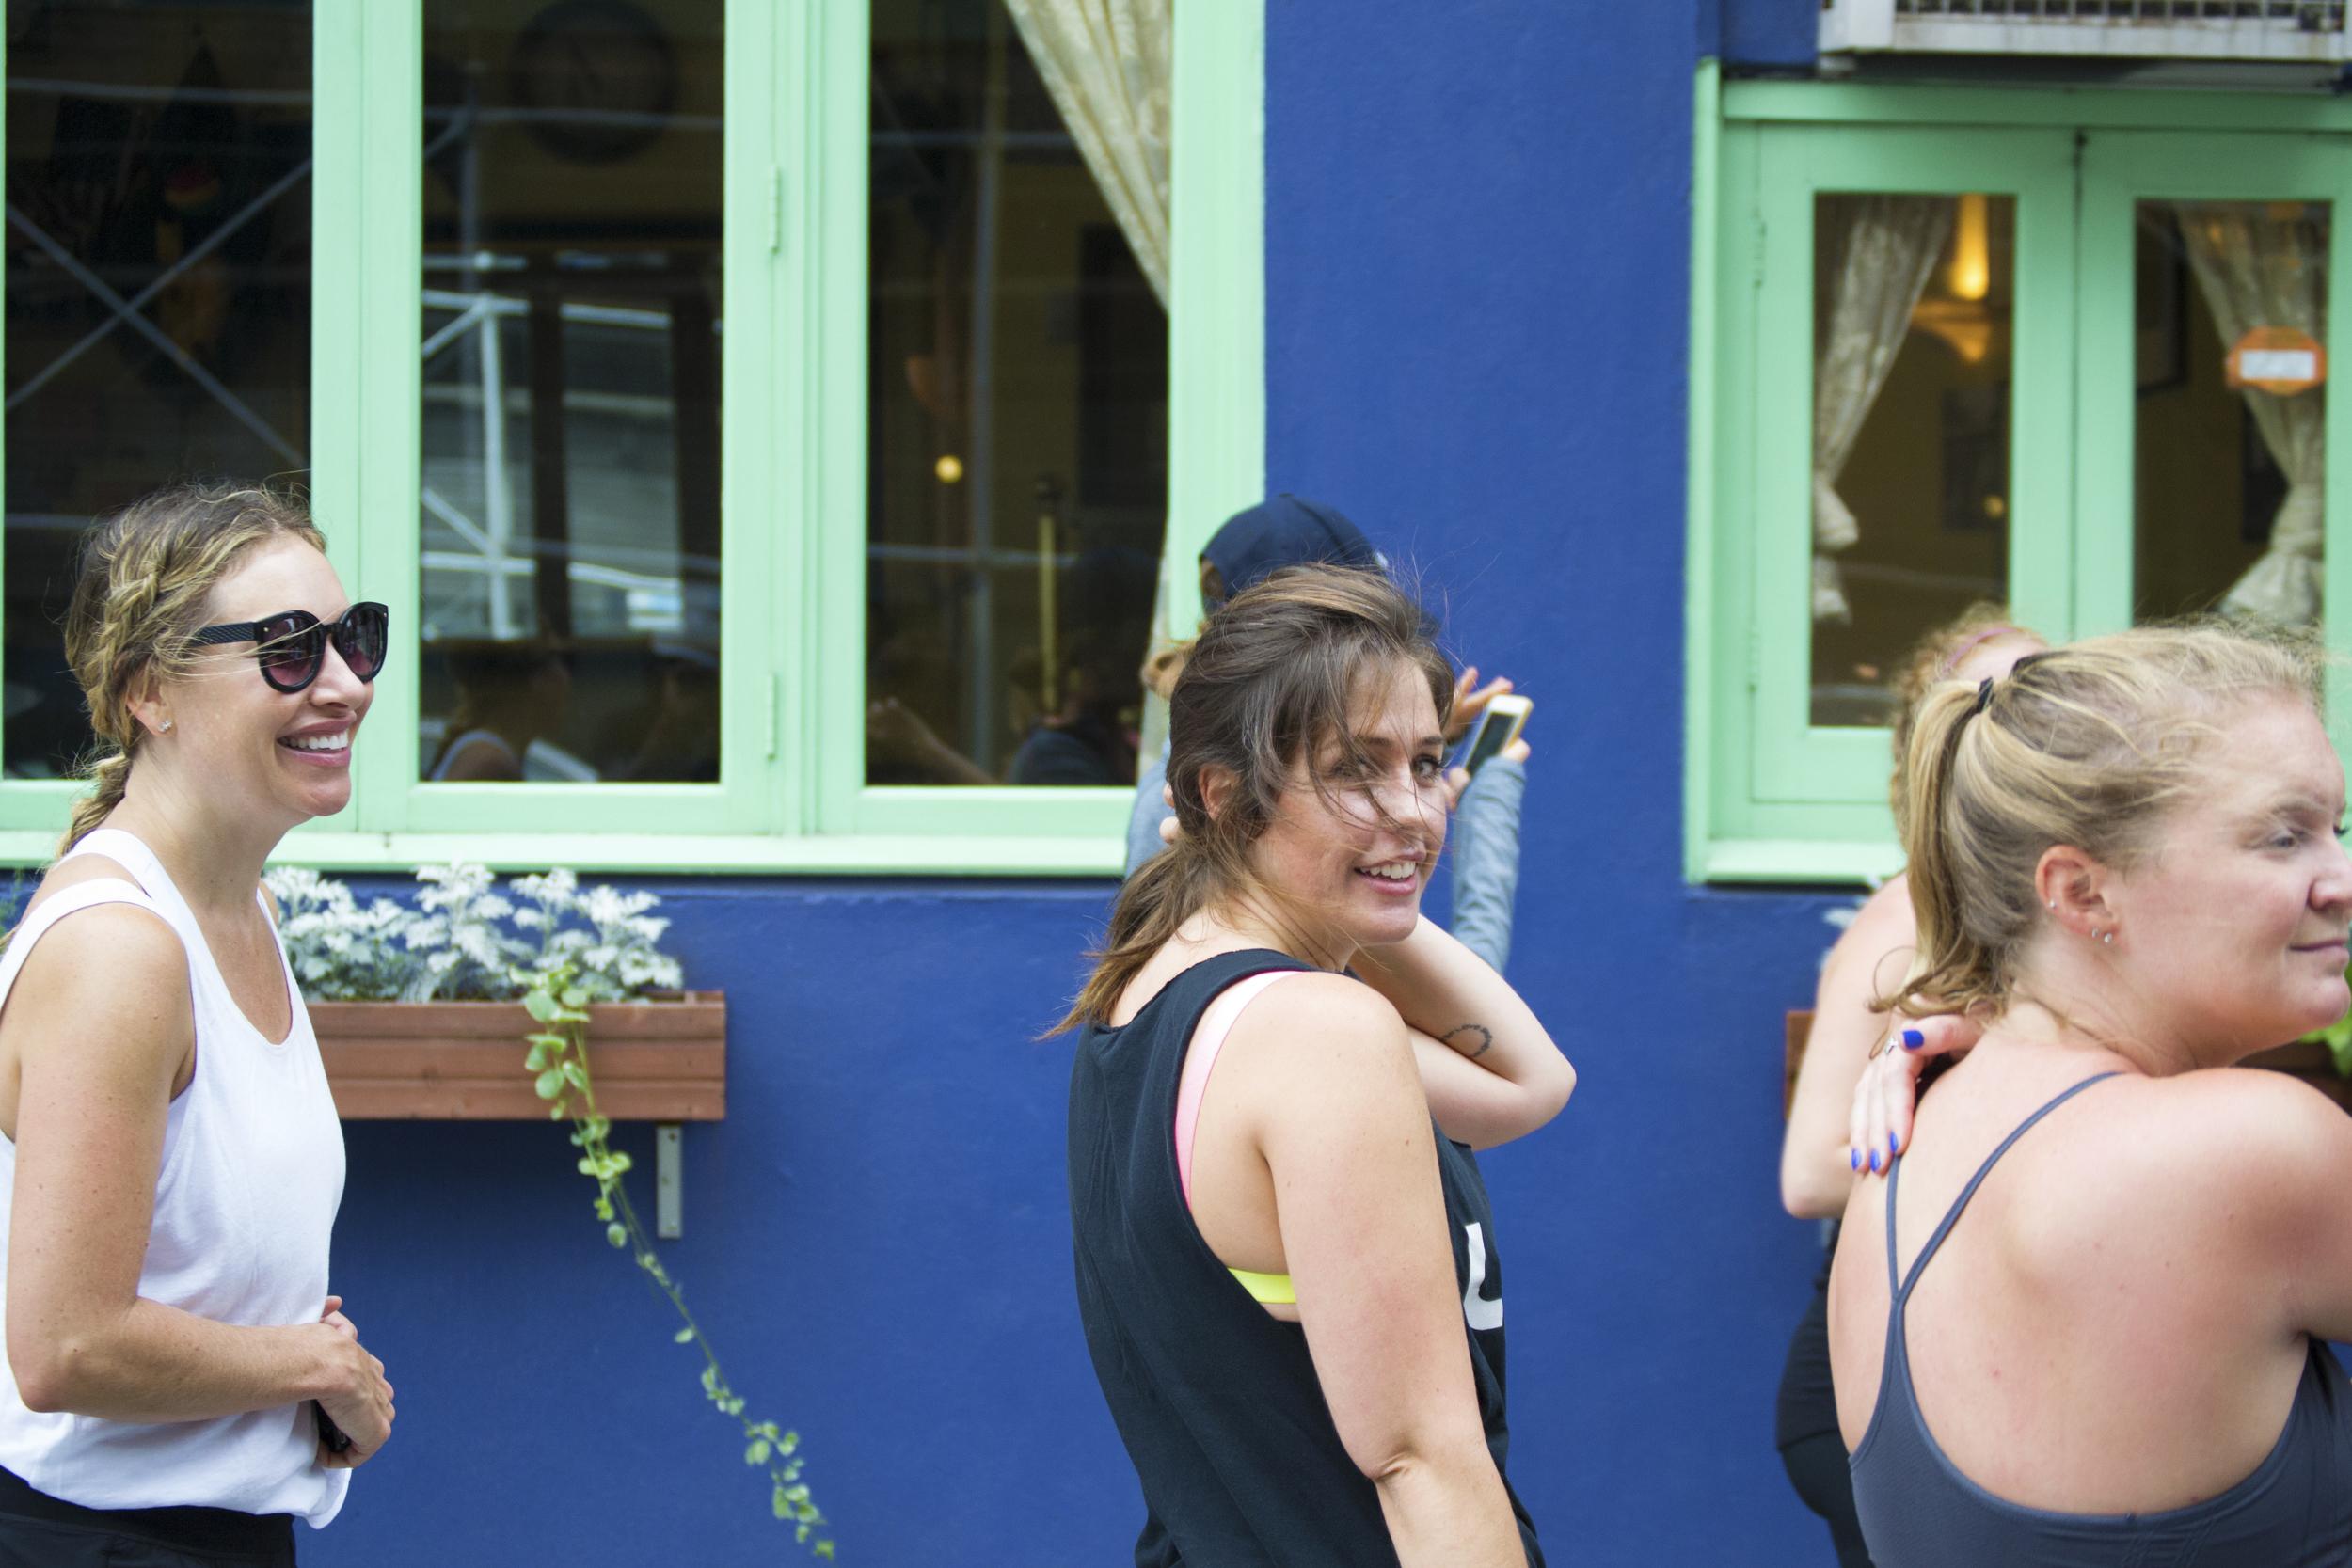 Runstreet-street-art-run-les